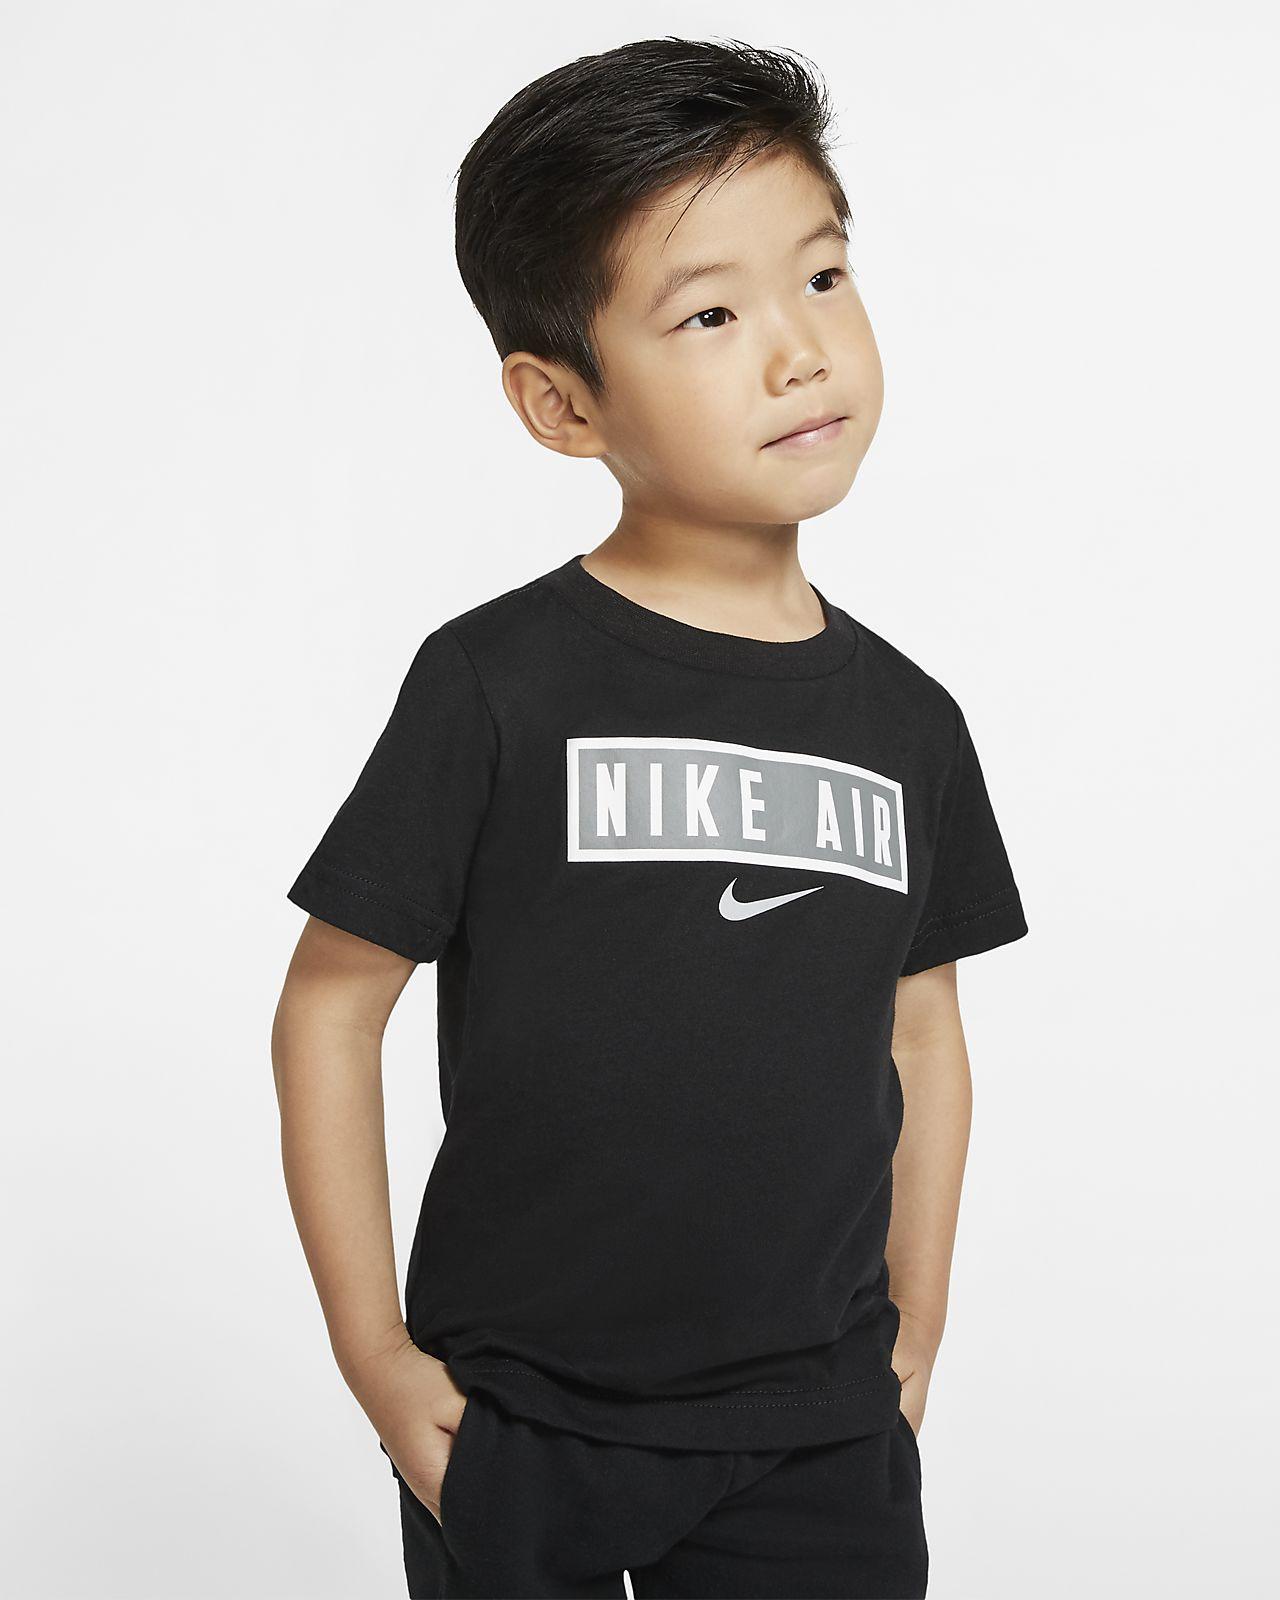 T-shirt a manica corta Nike Air - Bimbi piccoli